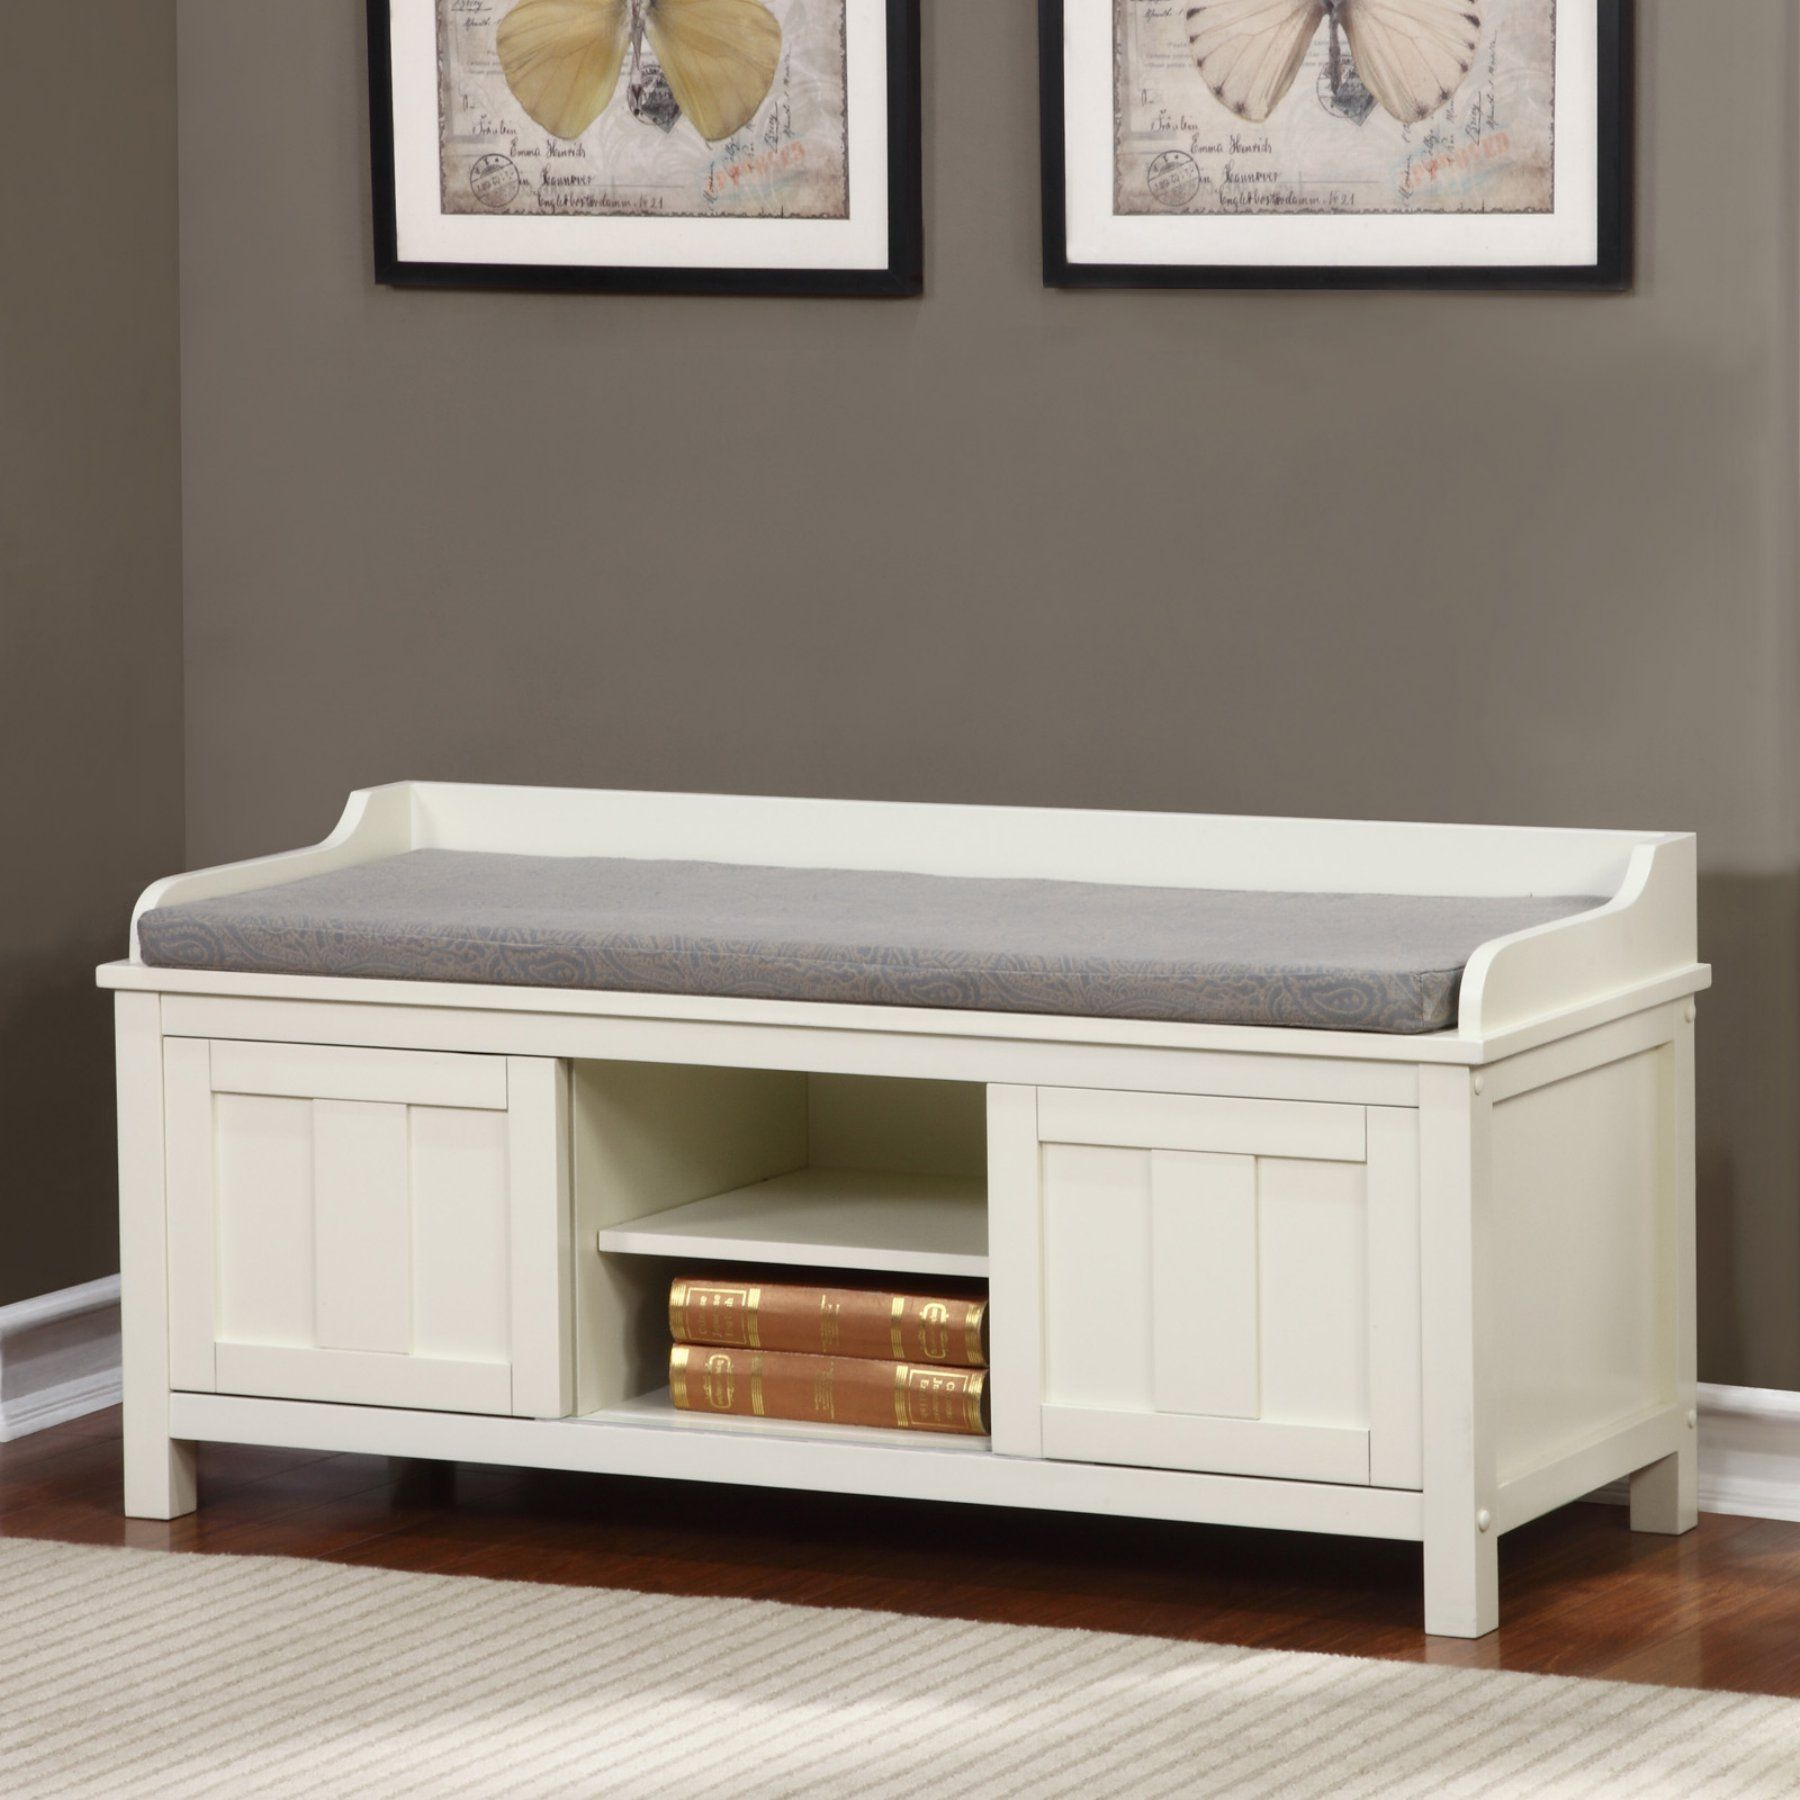 Linon Lakeville Indoor Storage Bench - 840212WHT01U